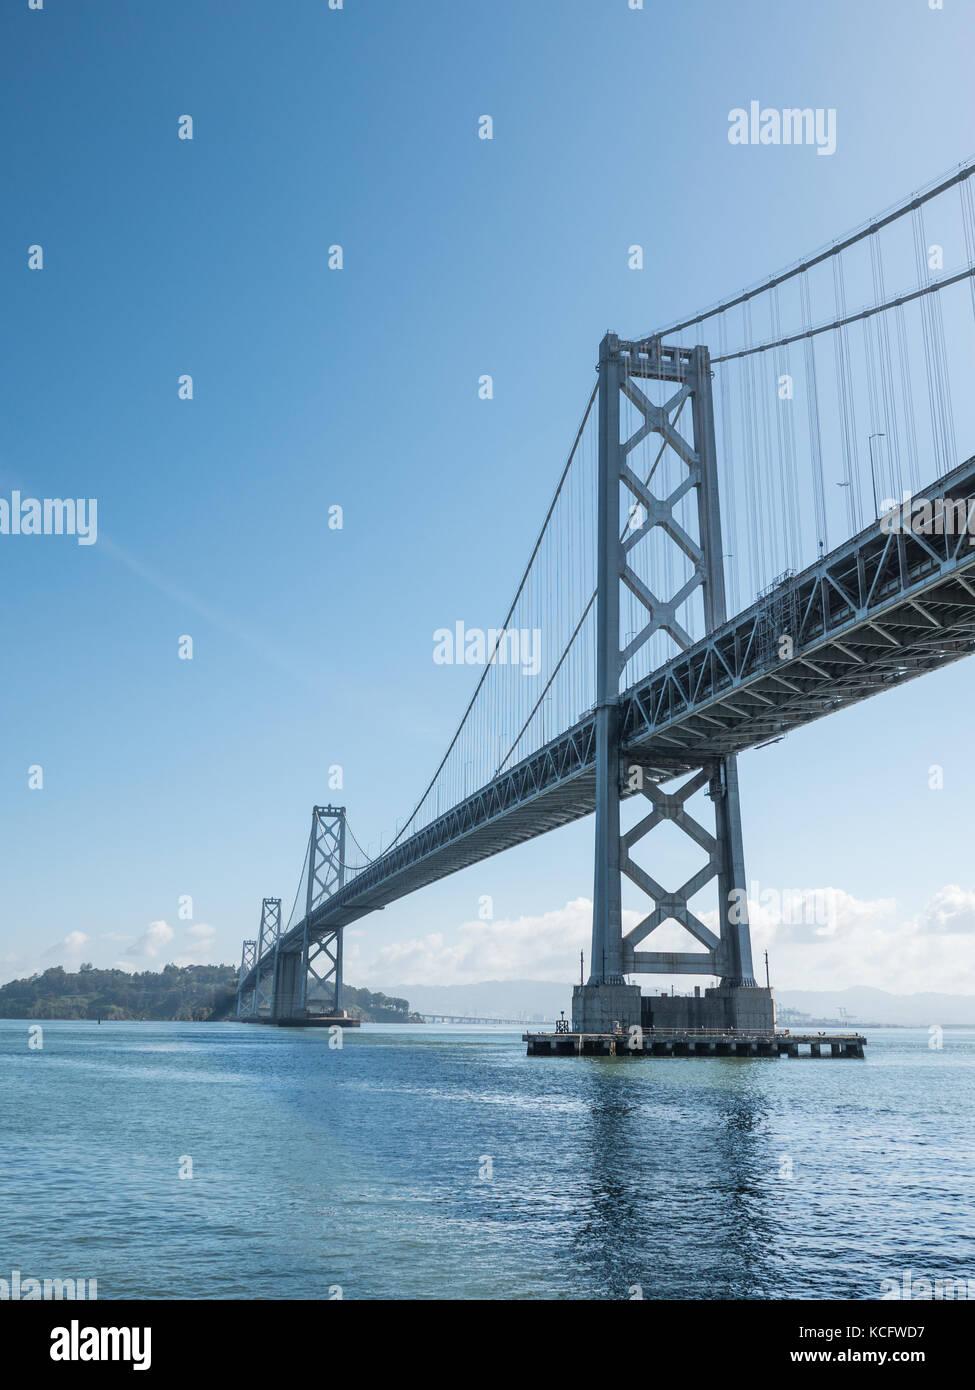 San Francisco April 20, 2017: Photograph taken of the double-deck San Francisco - Oakland Bay Bridge on April 20th, - Stock Image